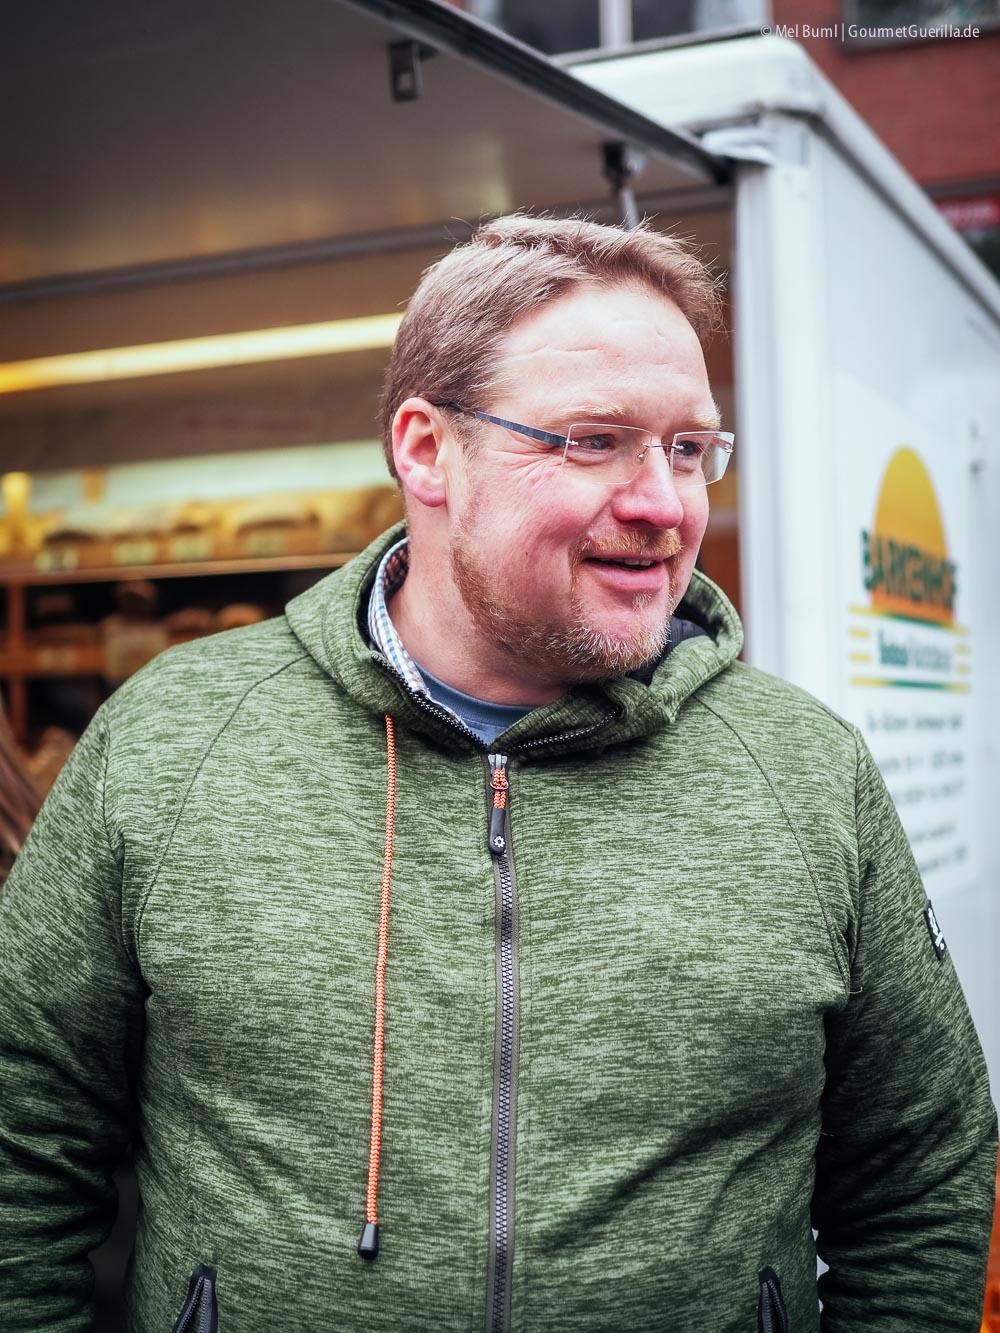 Bauernmarkt Oldenburg Biobäckerei Barkenhof Digital durchstarten |GourmetGuerilla.de